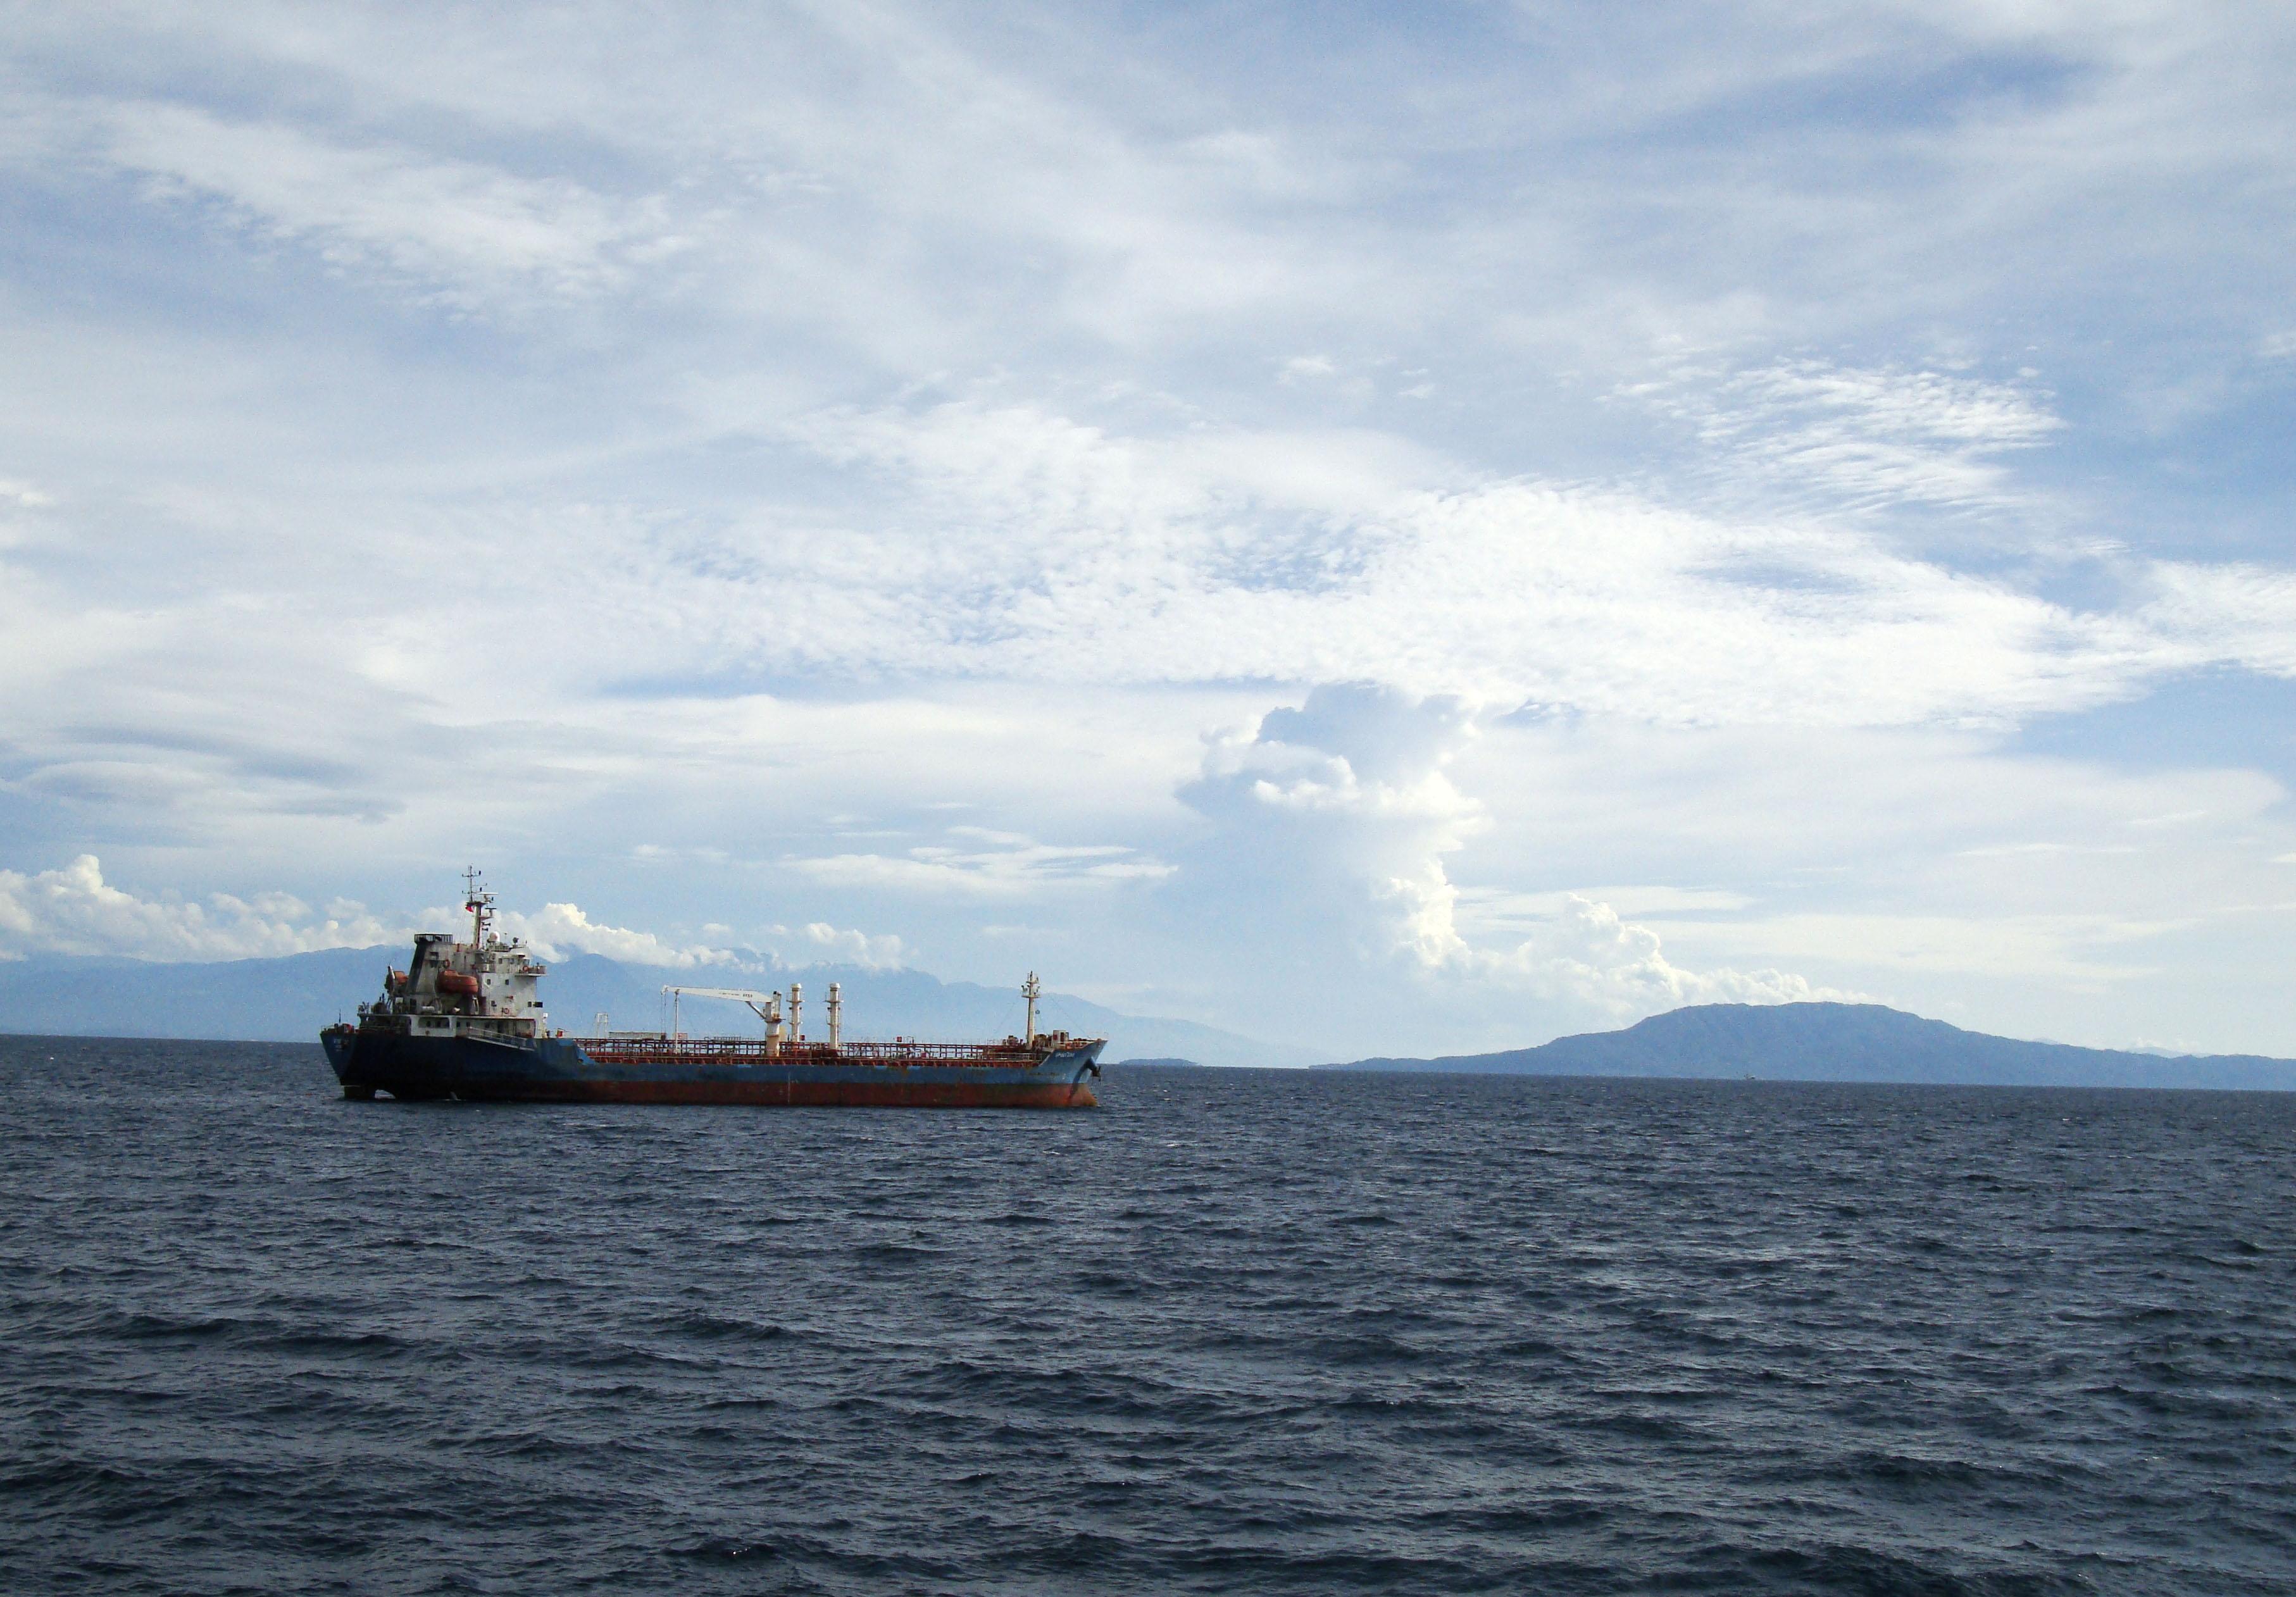 IMO 9471185 Tanker SP Beijing Majuro Batangus Bay Philppines 2010 01